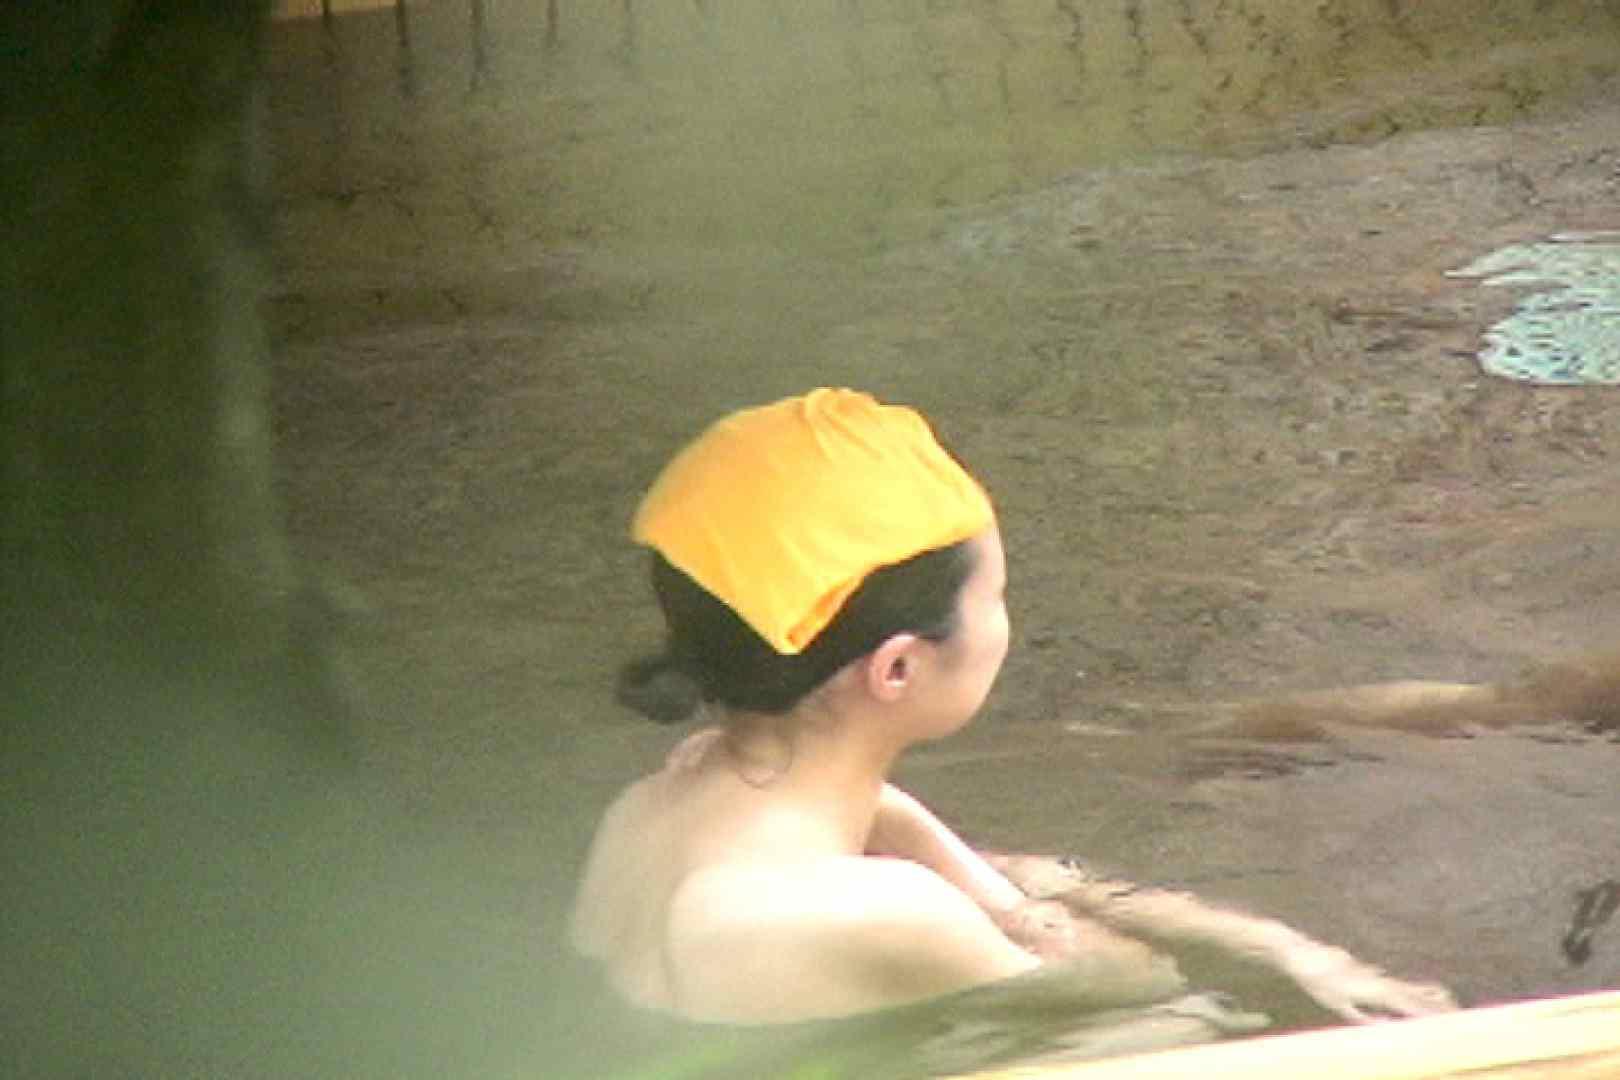 Aquaな露天風呂Vol.453 盗撮シリーズ | 露天風呂編  82PIX 23